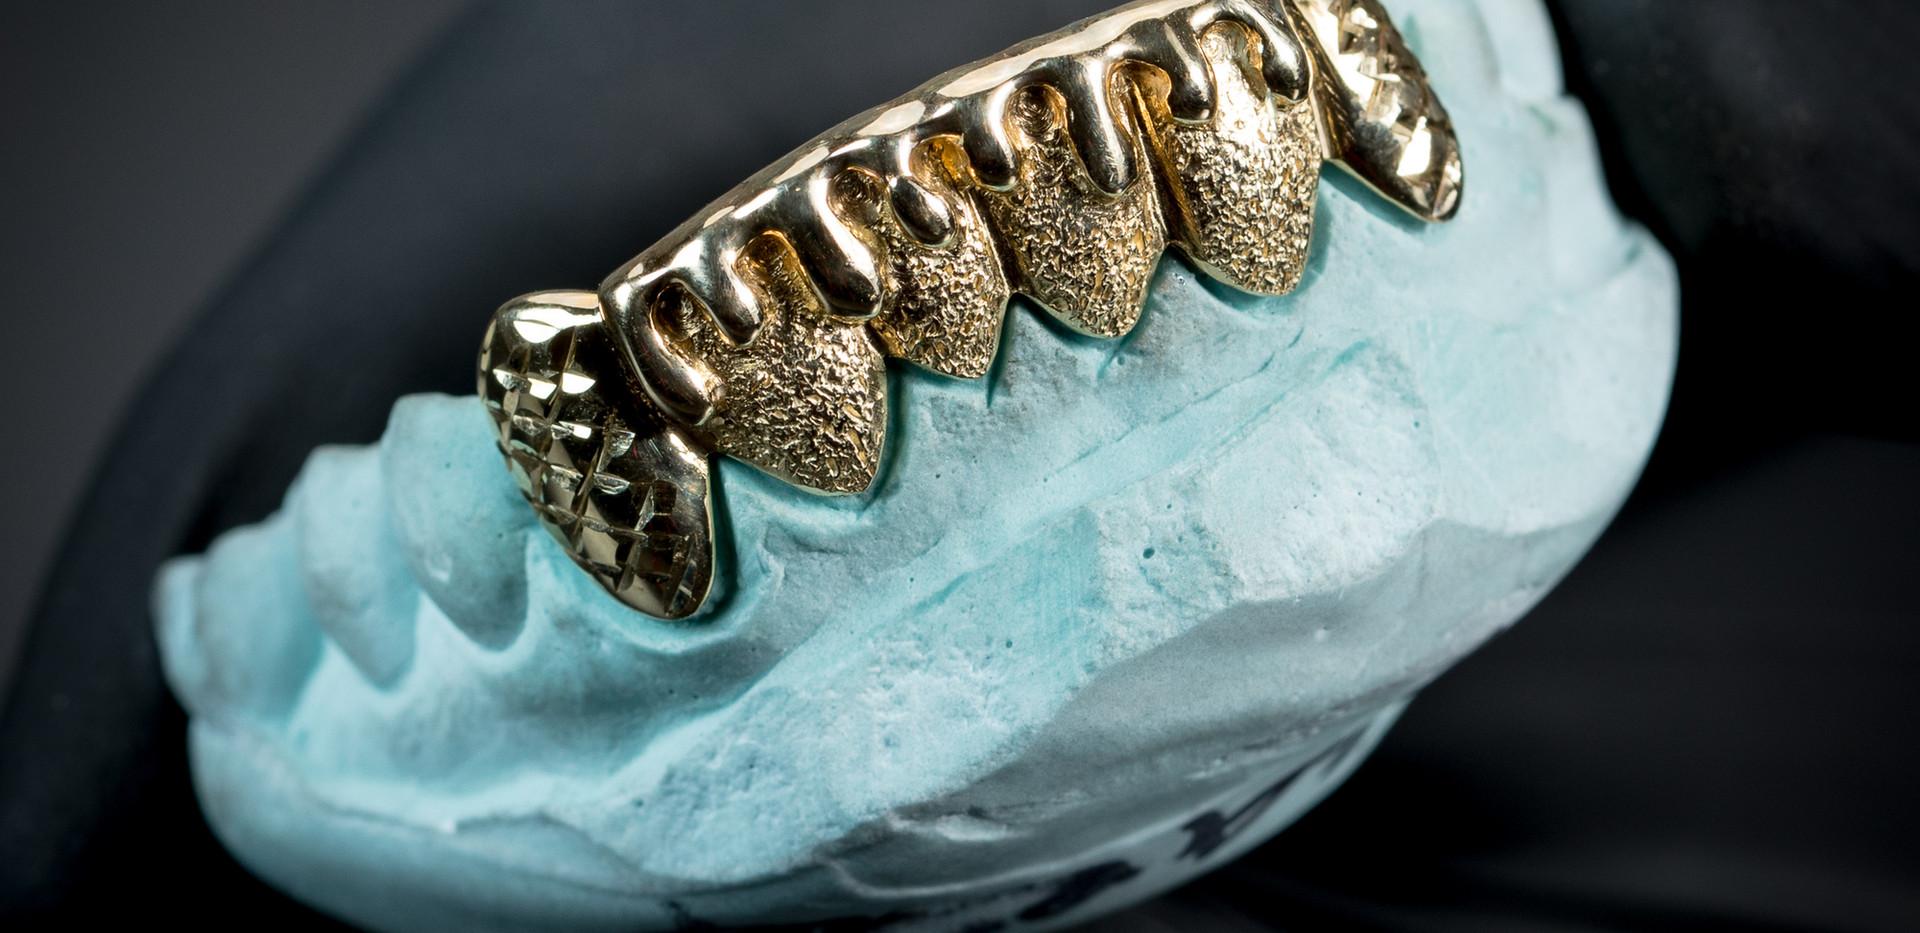 Dripping Grillz Designed By. Tim Da Jeweler